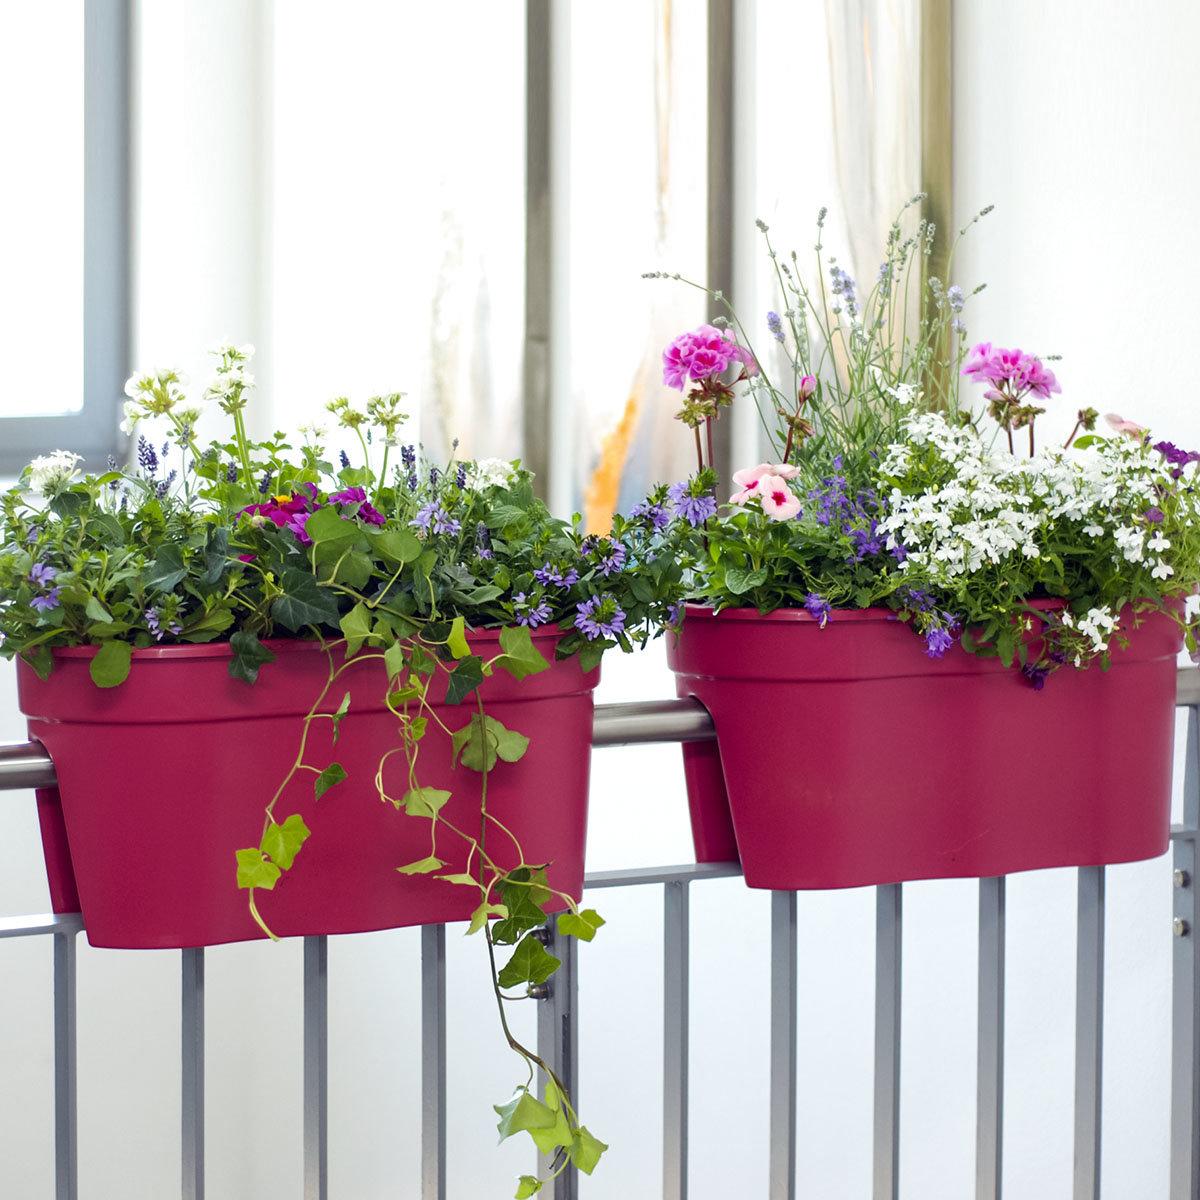 Geländertopf Flowerclip, 57,5 x 27,7 x 27 cm, rosa | #2